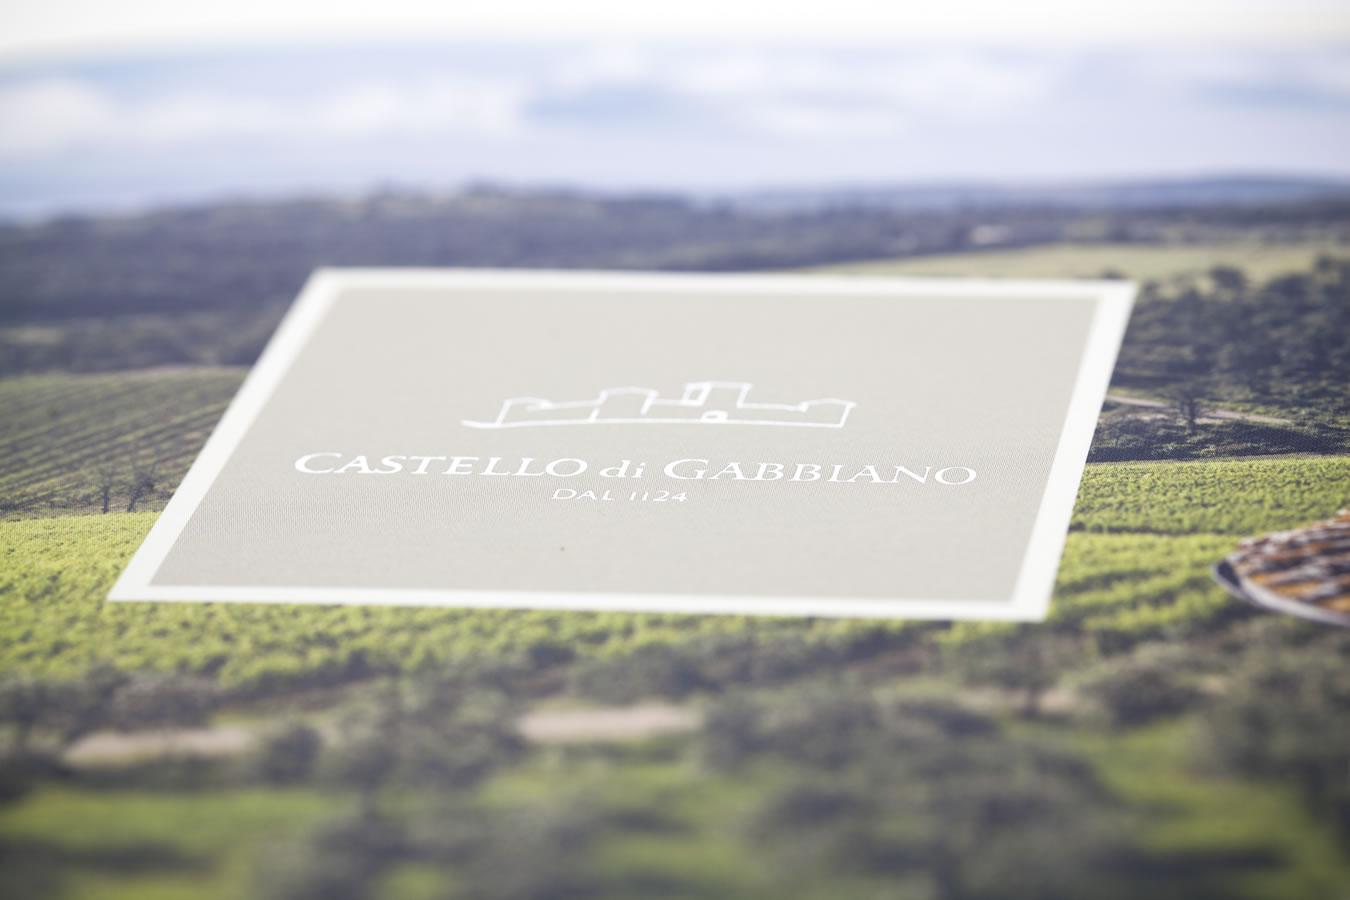 Castello di Gabbiano Hospitality IMG 0004